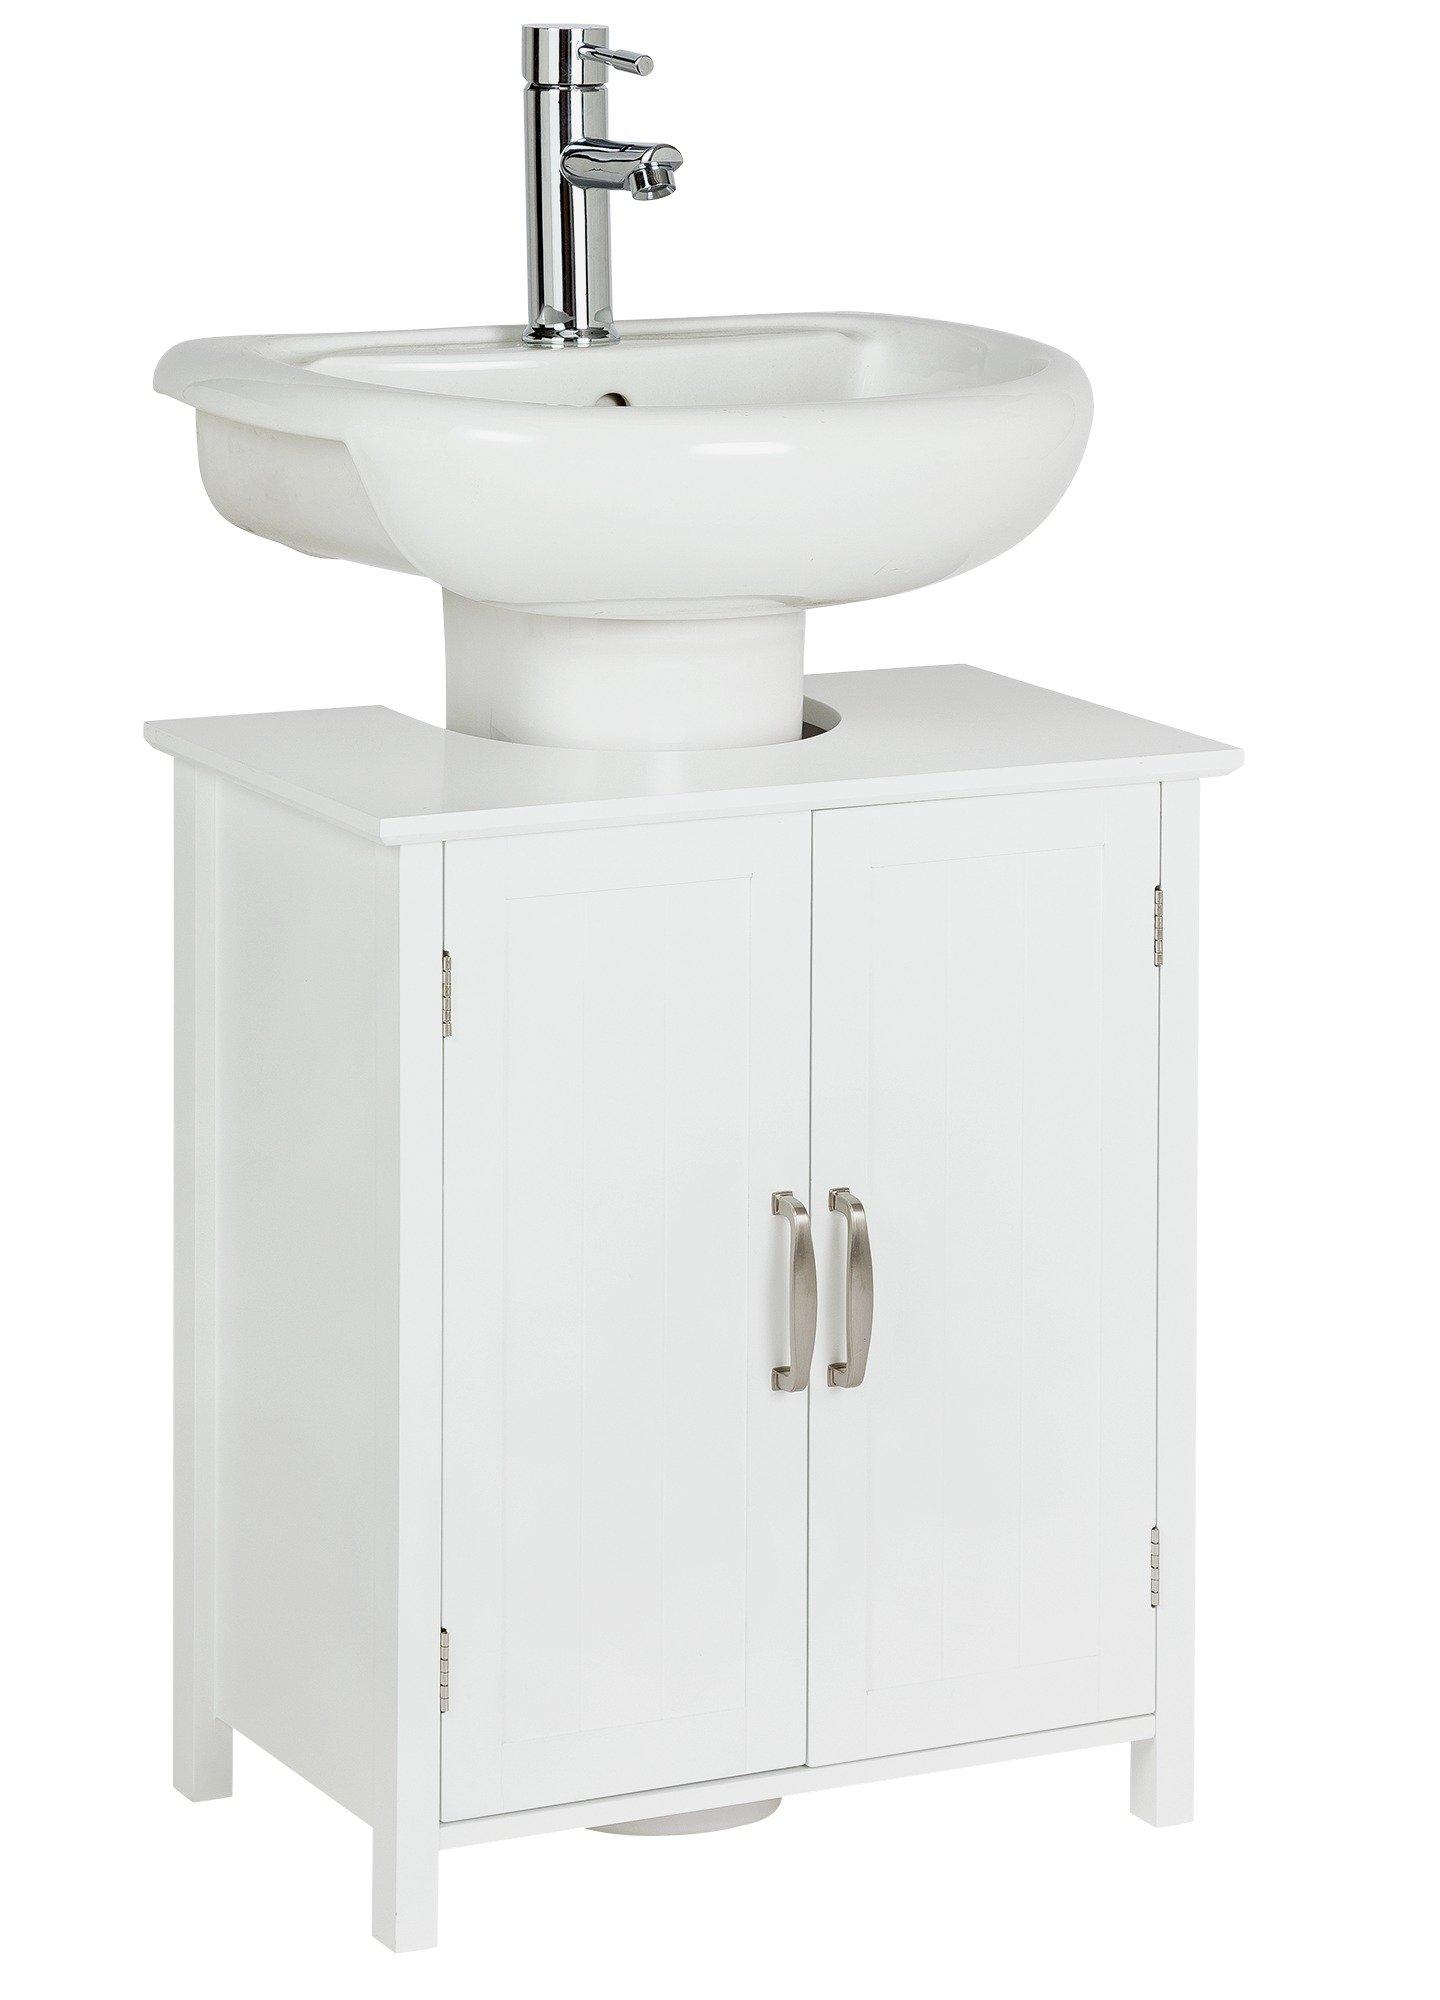 Buy Argos Home Tongue And Groove Undersink Storage Unit   White | Bathroom  Shelves And Storage Units | Argos